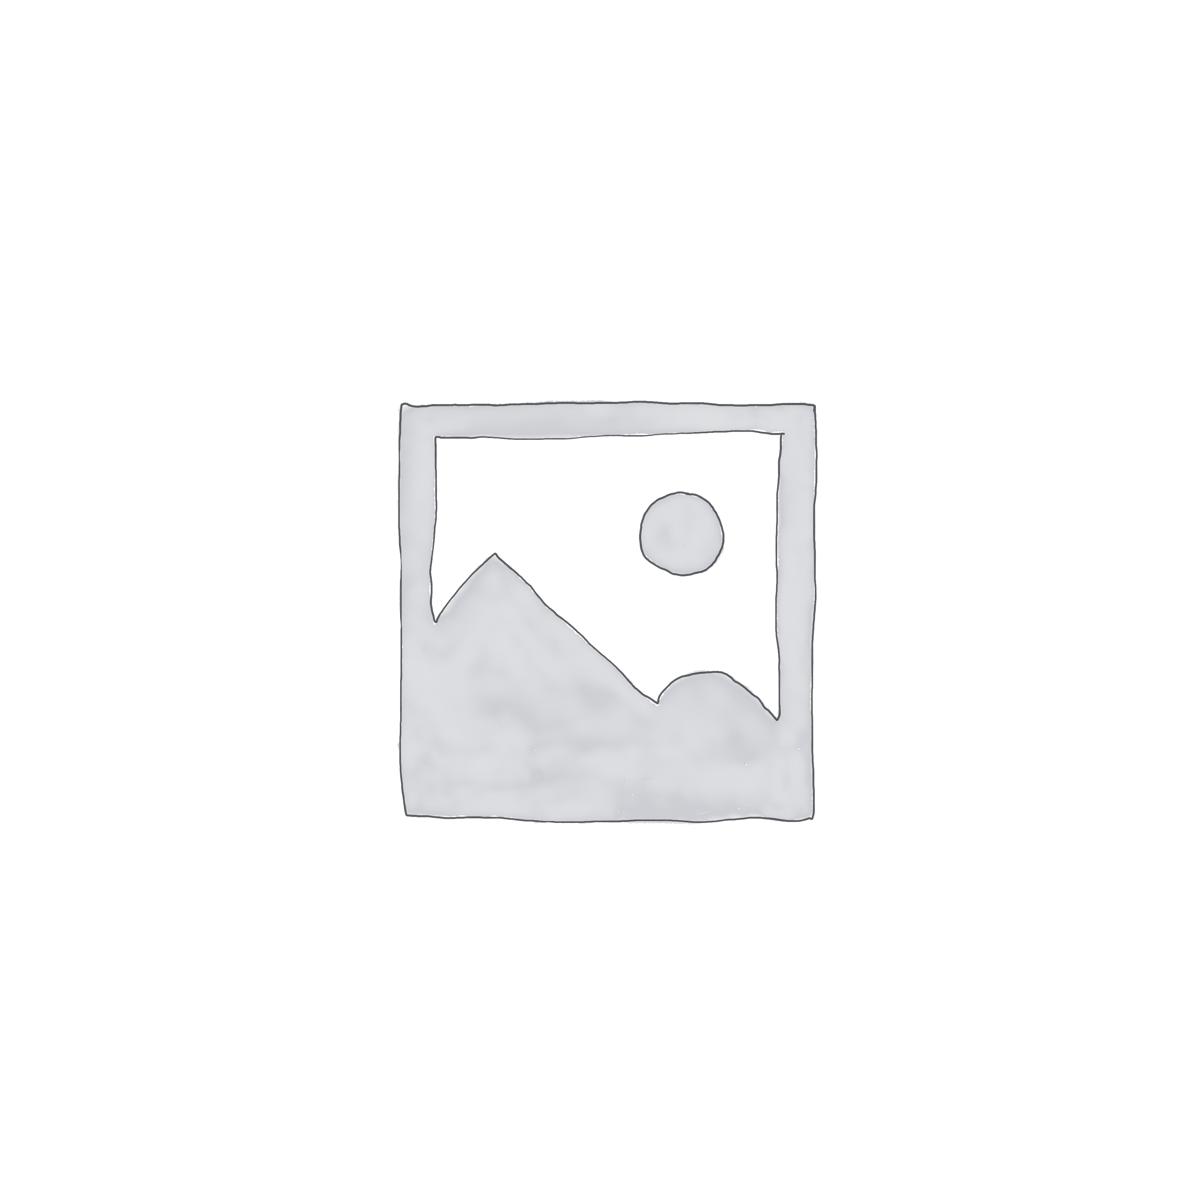 Ceiling Gold Flourish Pattern Wallpaper Mural